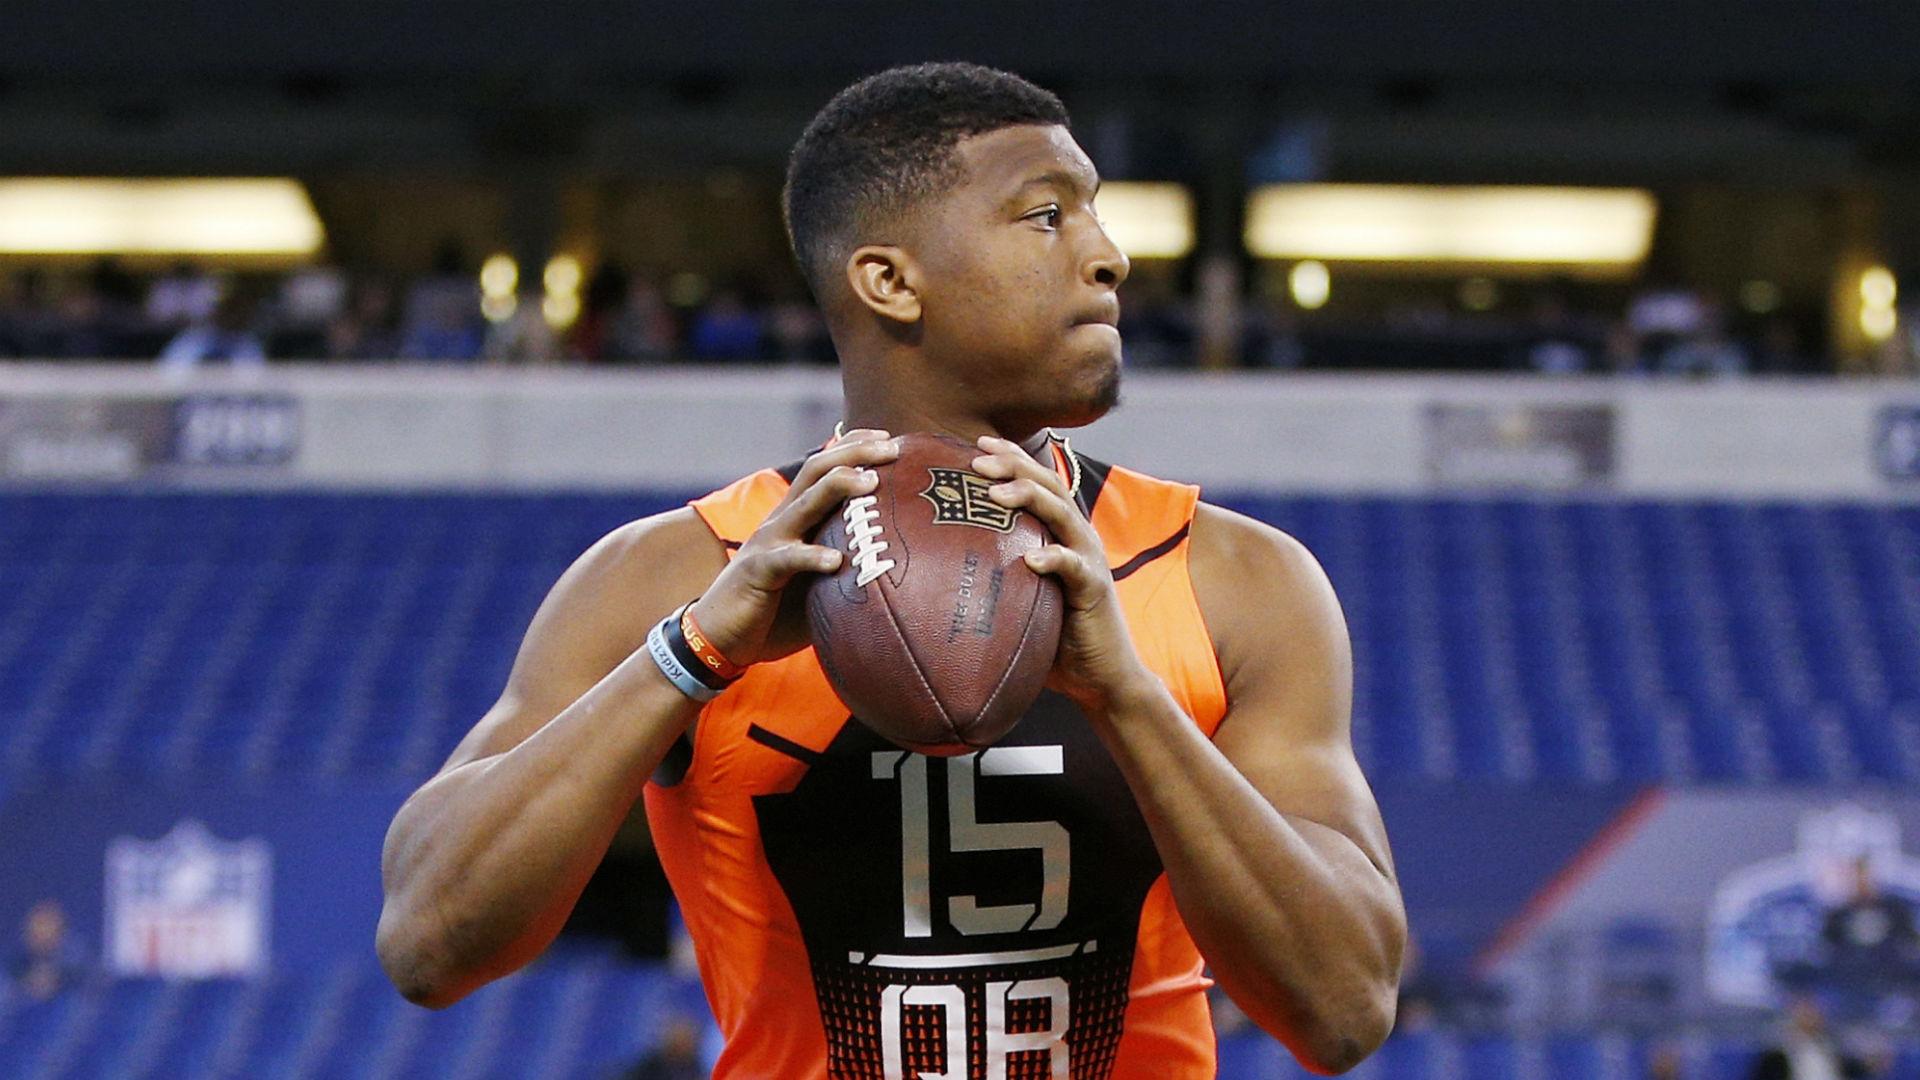 Buccaneers waste no more time, promote Jameis Winston to starting quarterback